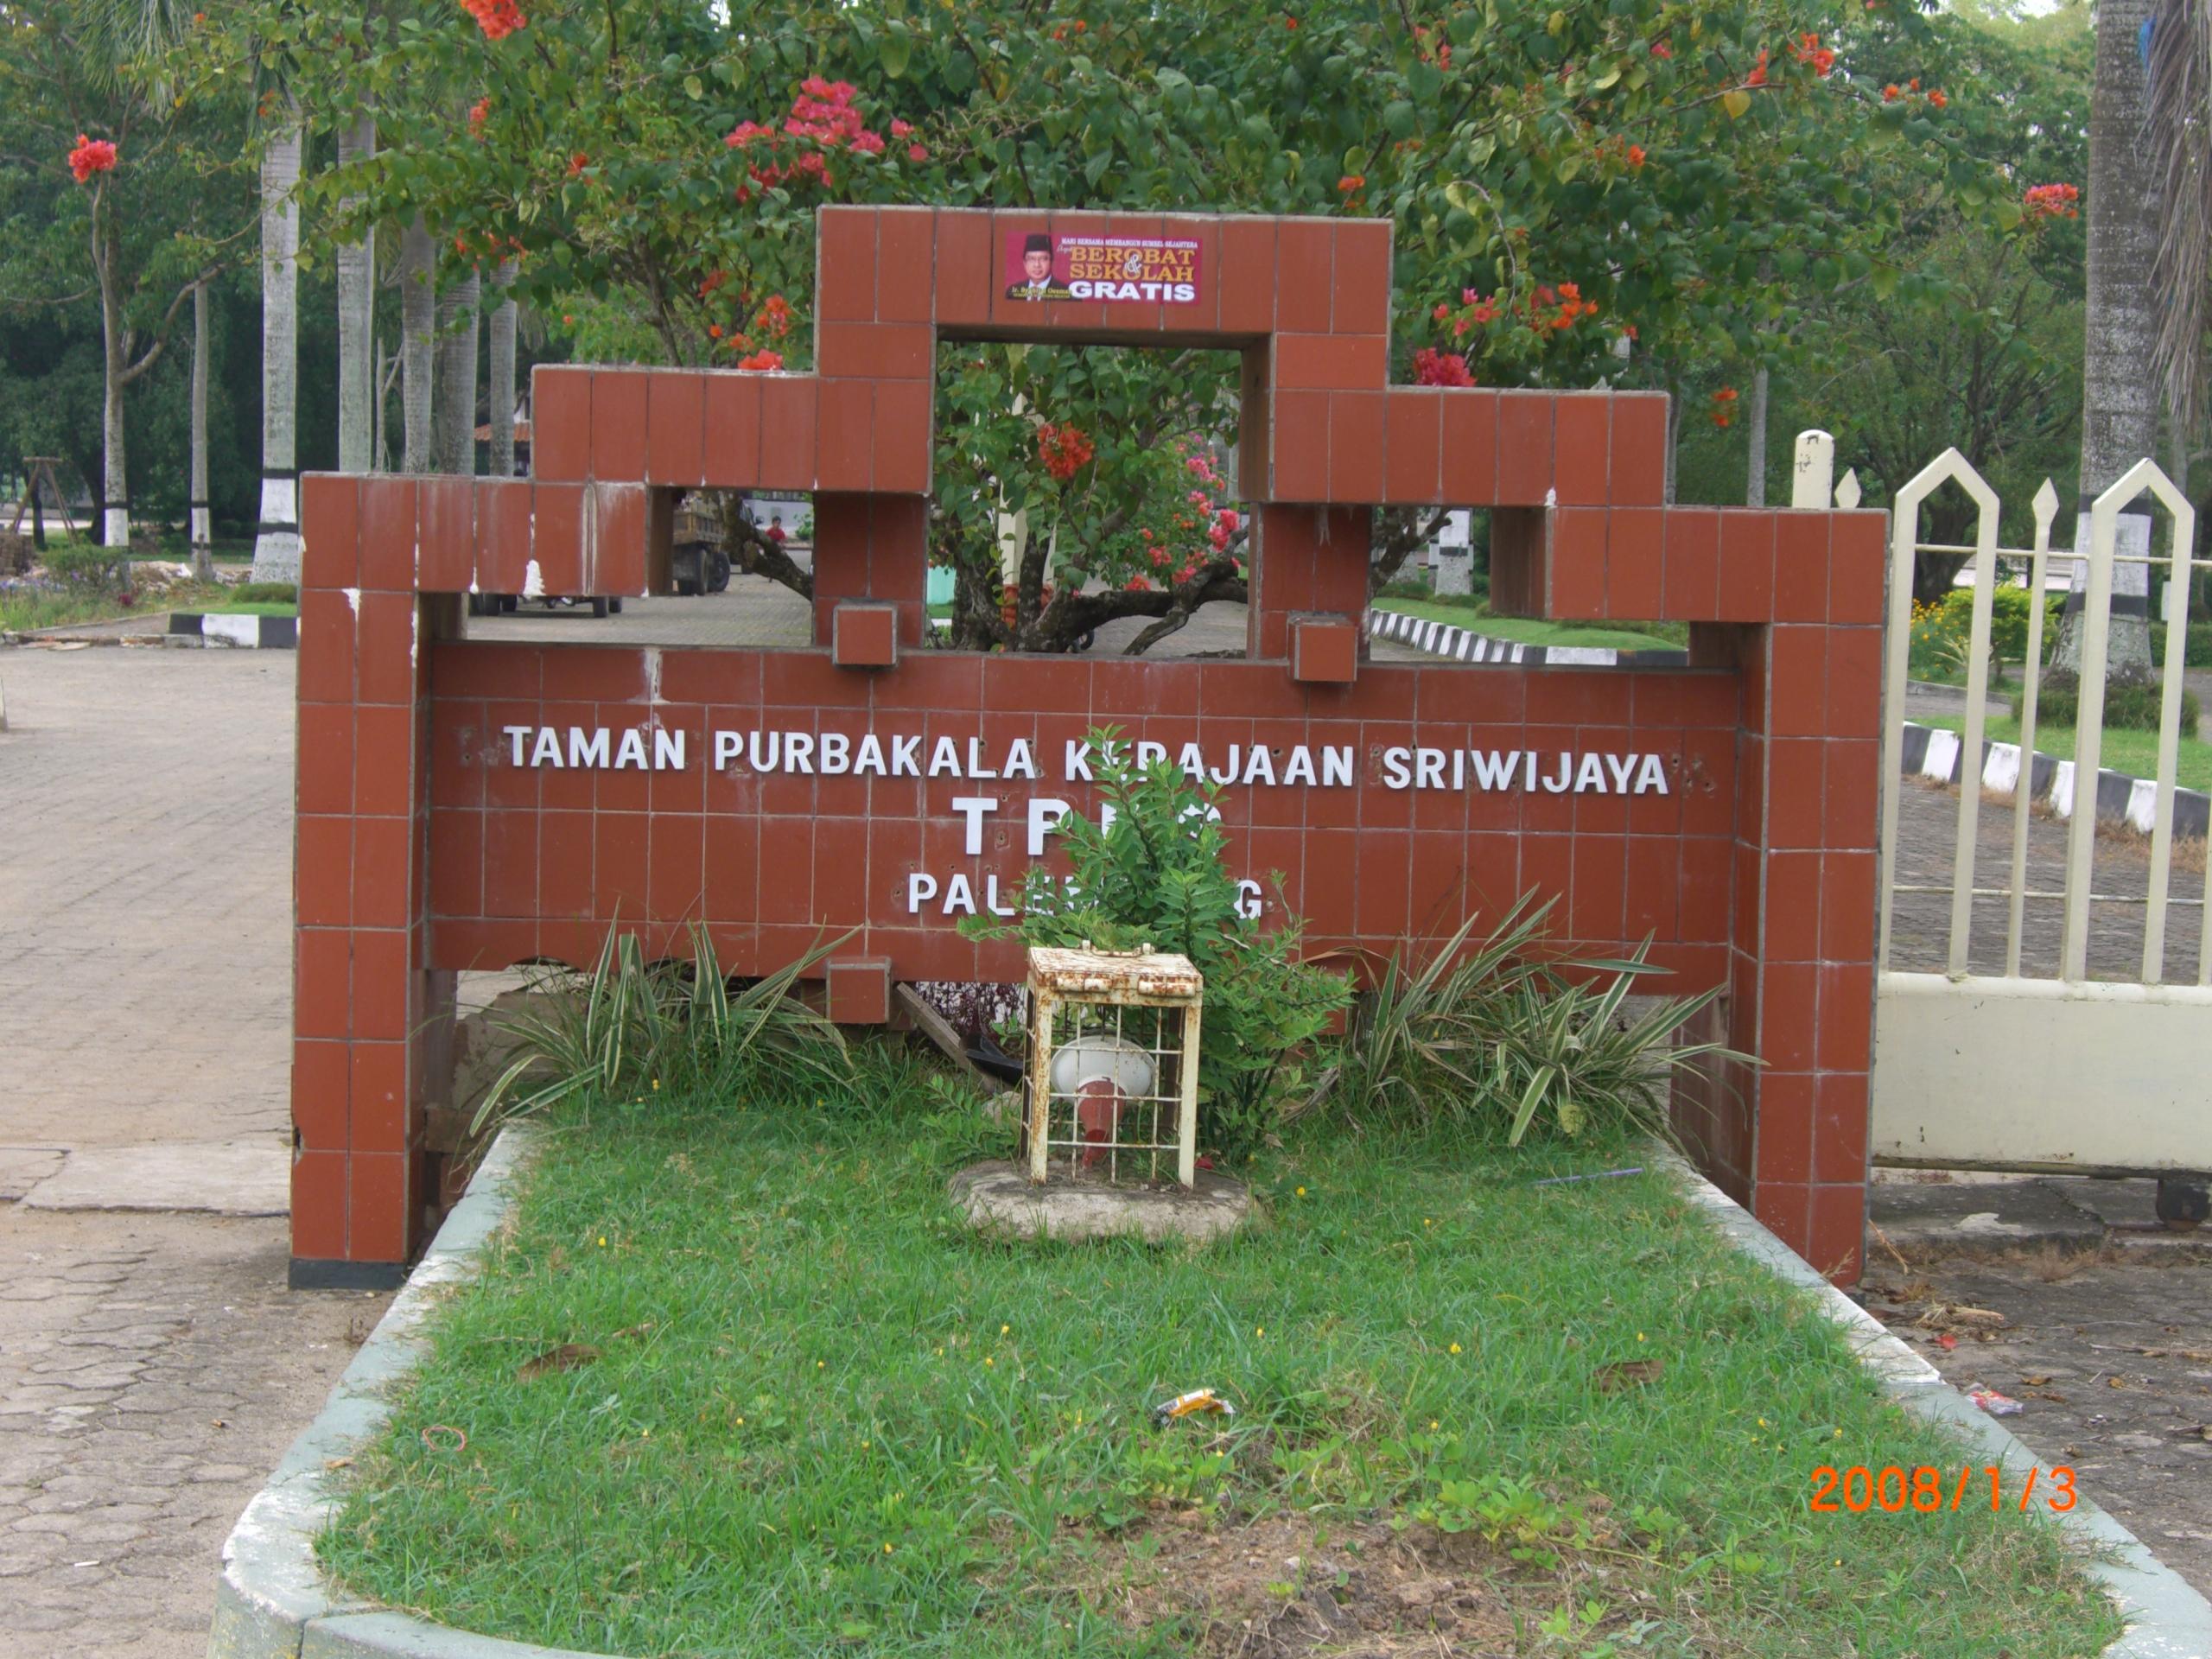 Taman Purbakala Kerajaan Palembang Adilkurnia Notes Sriwijaya Kota